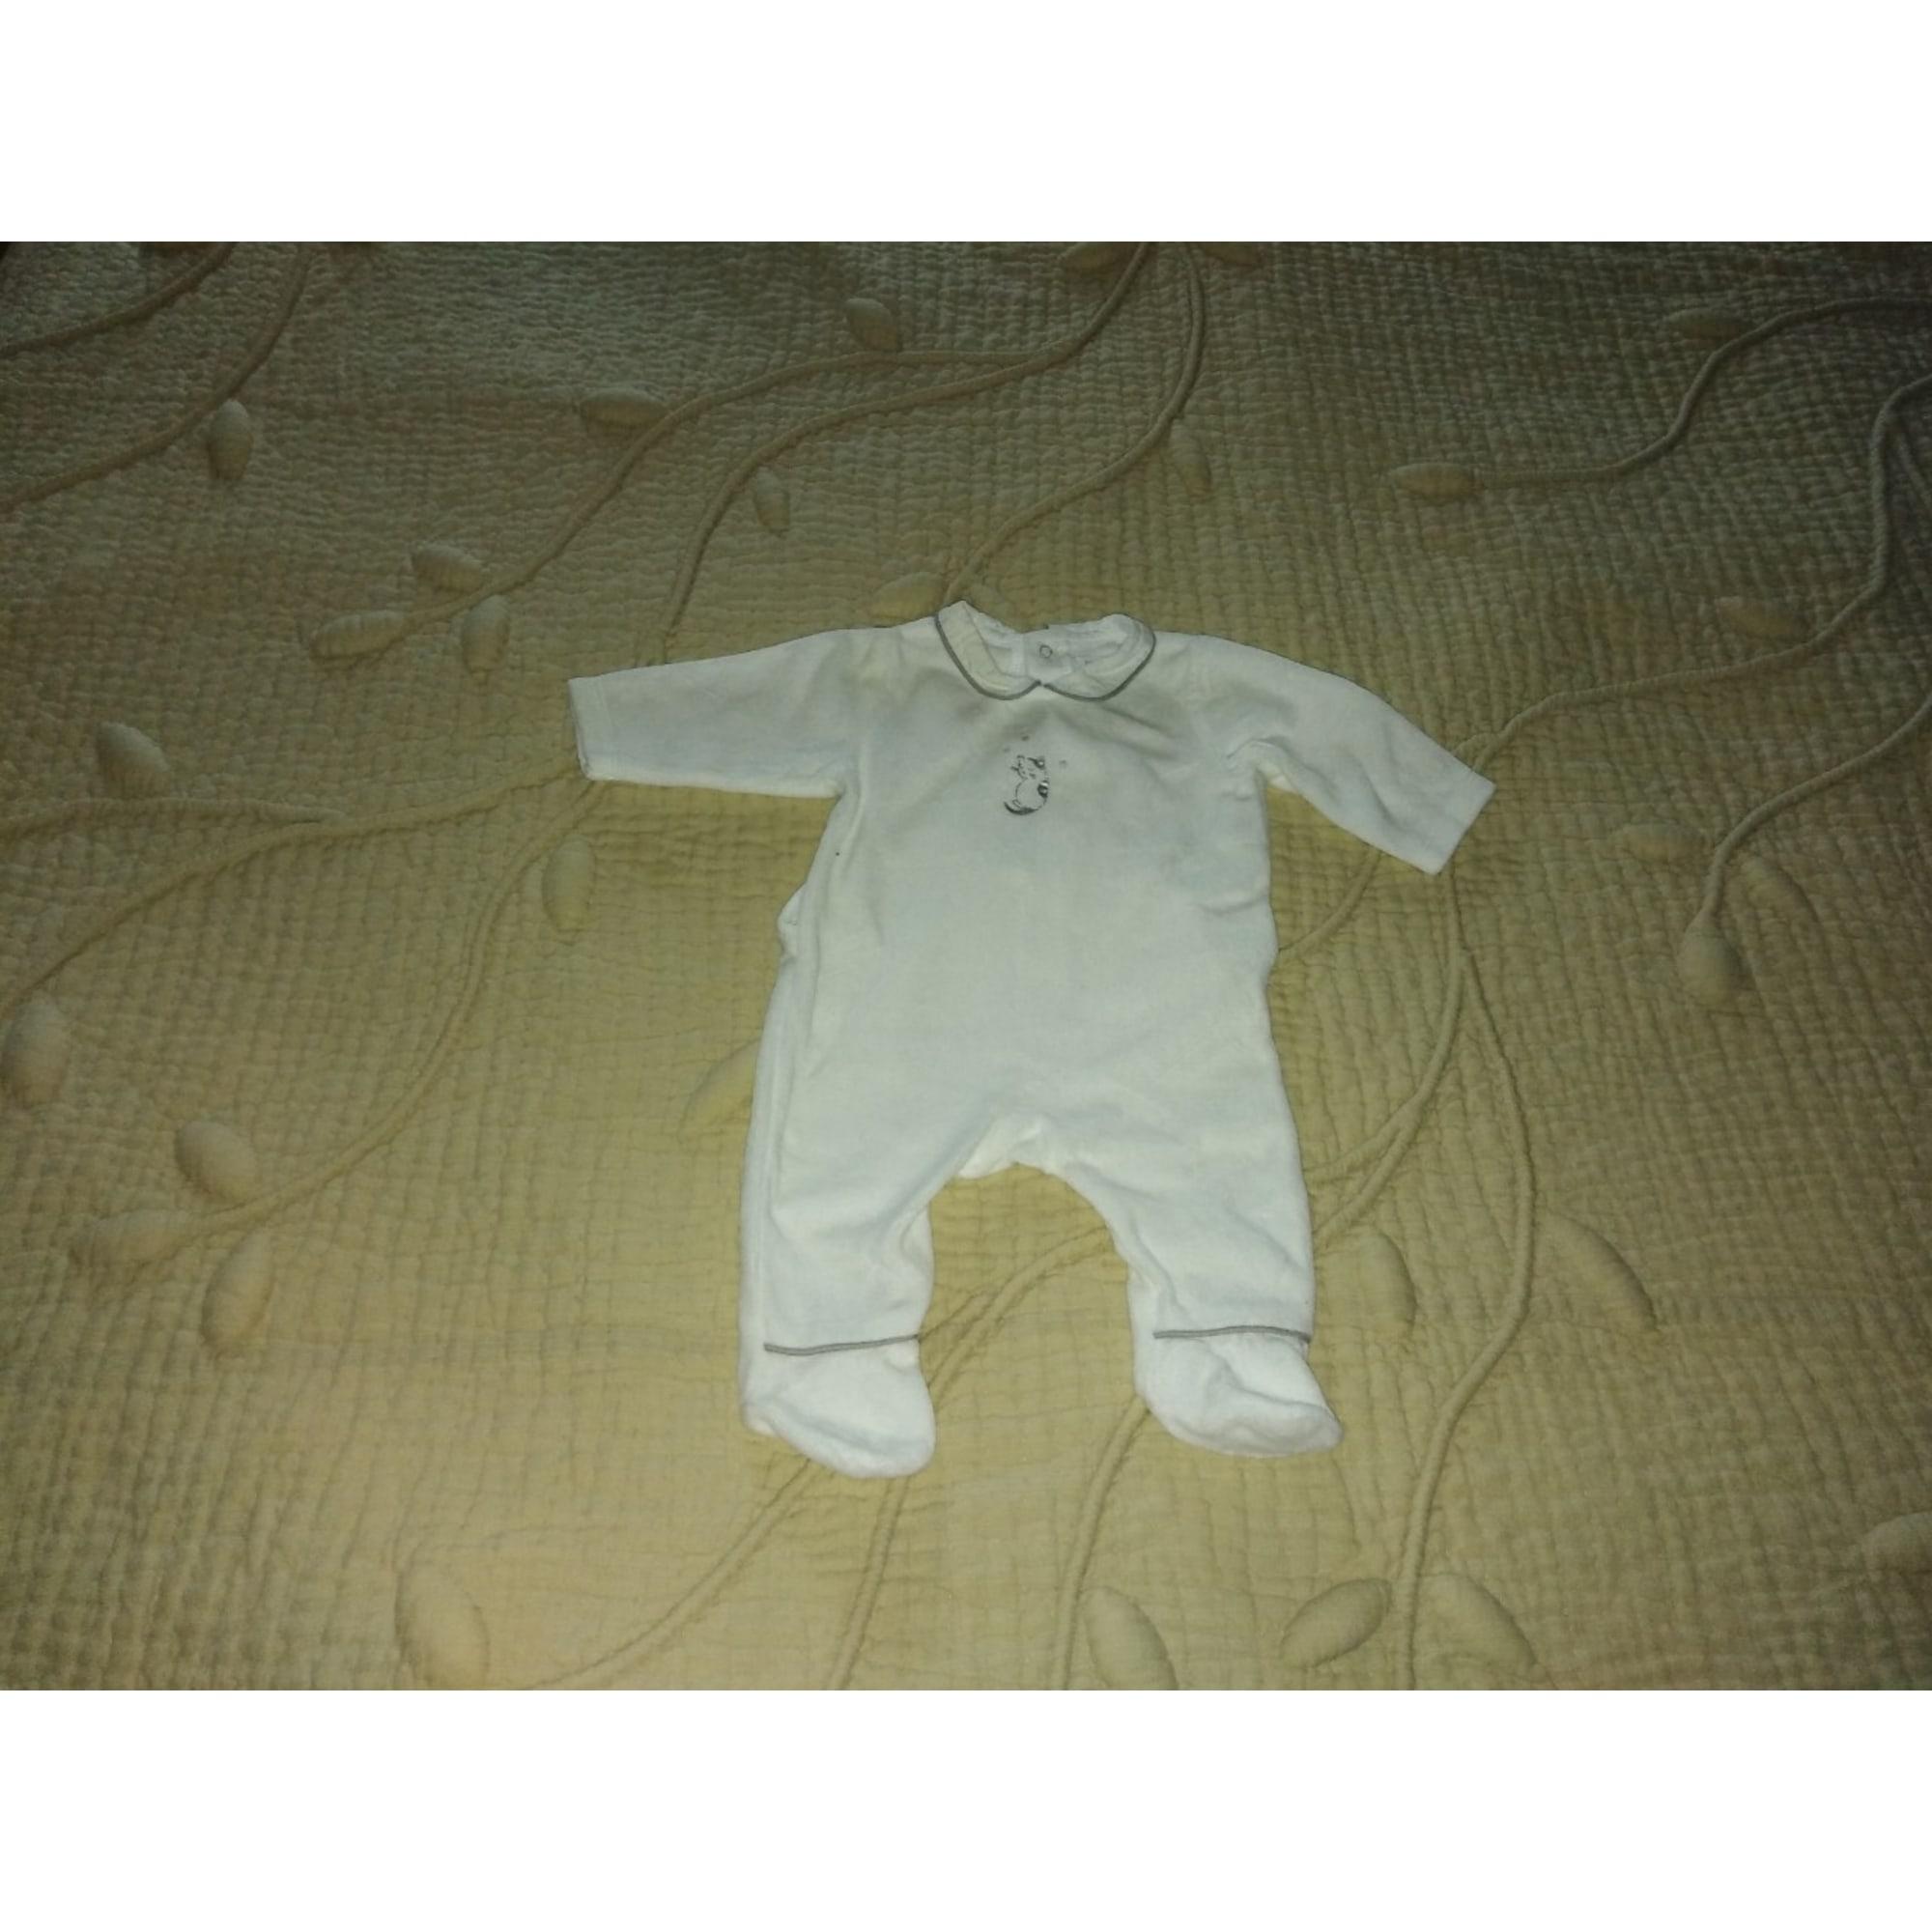 Pyjama BOUT'CHOU White, off-white, ecru